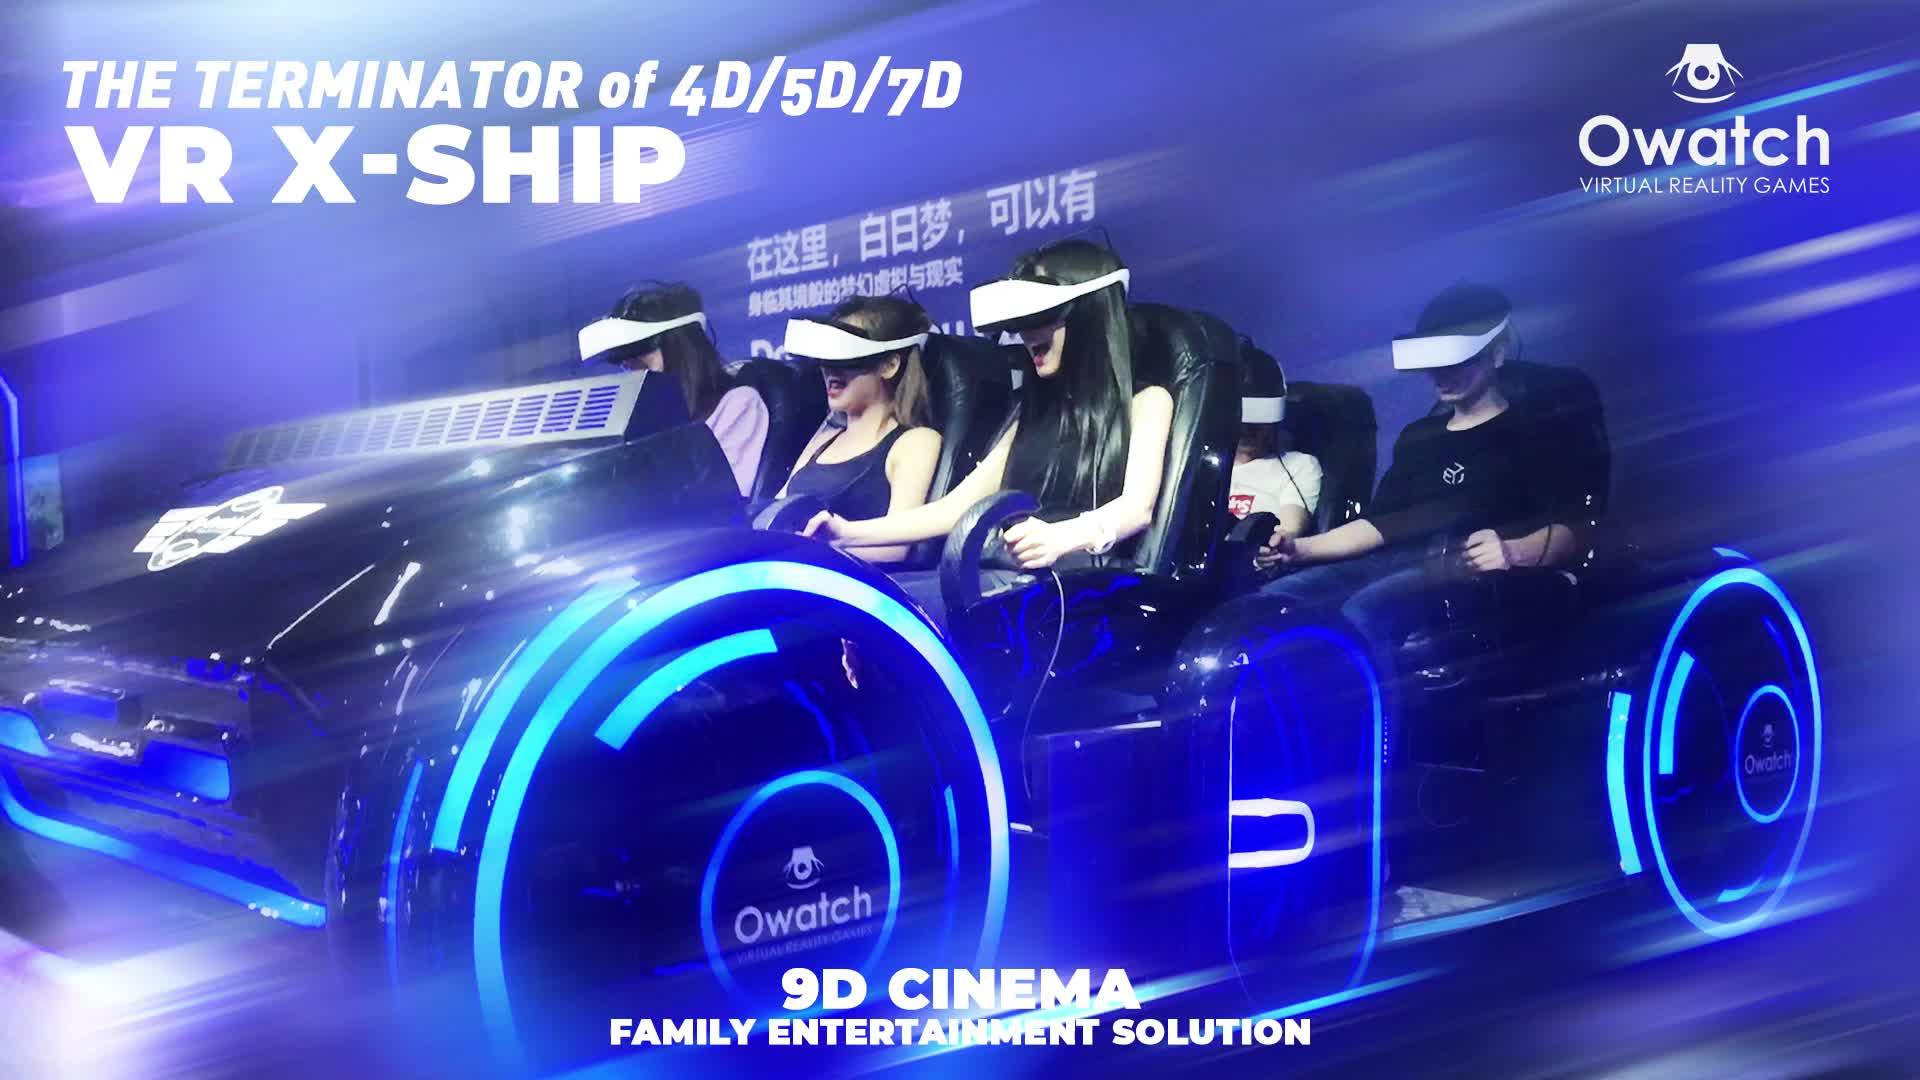 Owatch - Playground Equipment Simulator Virtual Reality Shooting Game Movies VR Tank 6 Seats